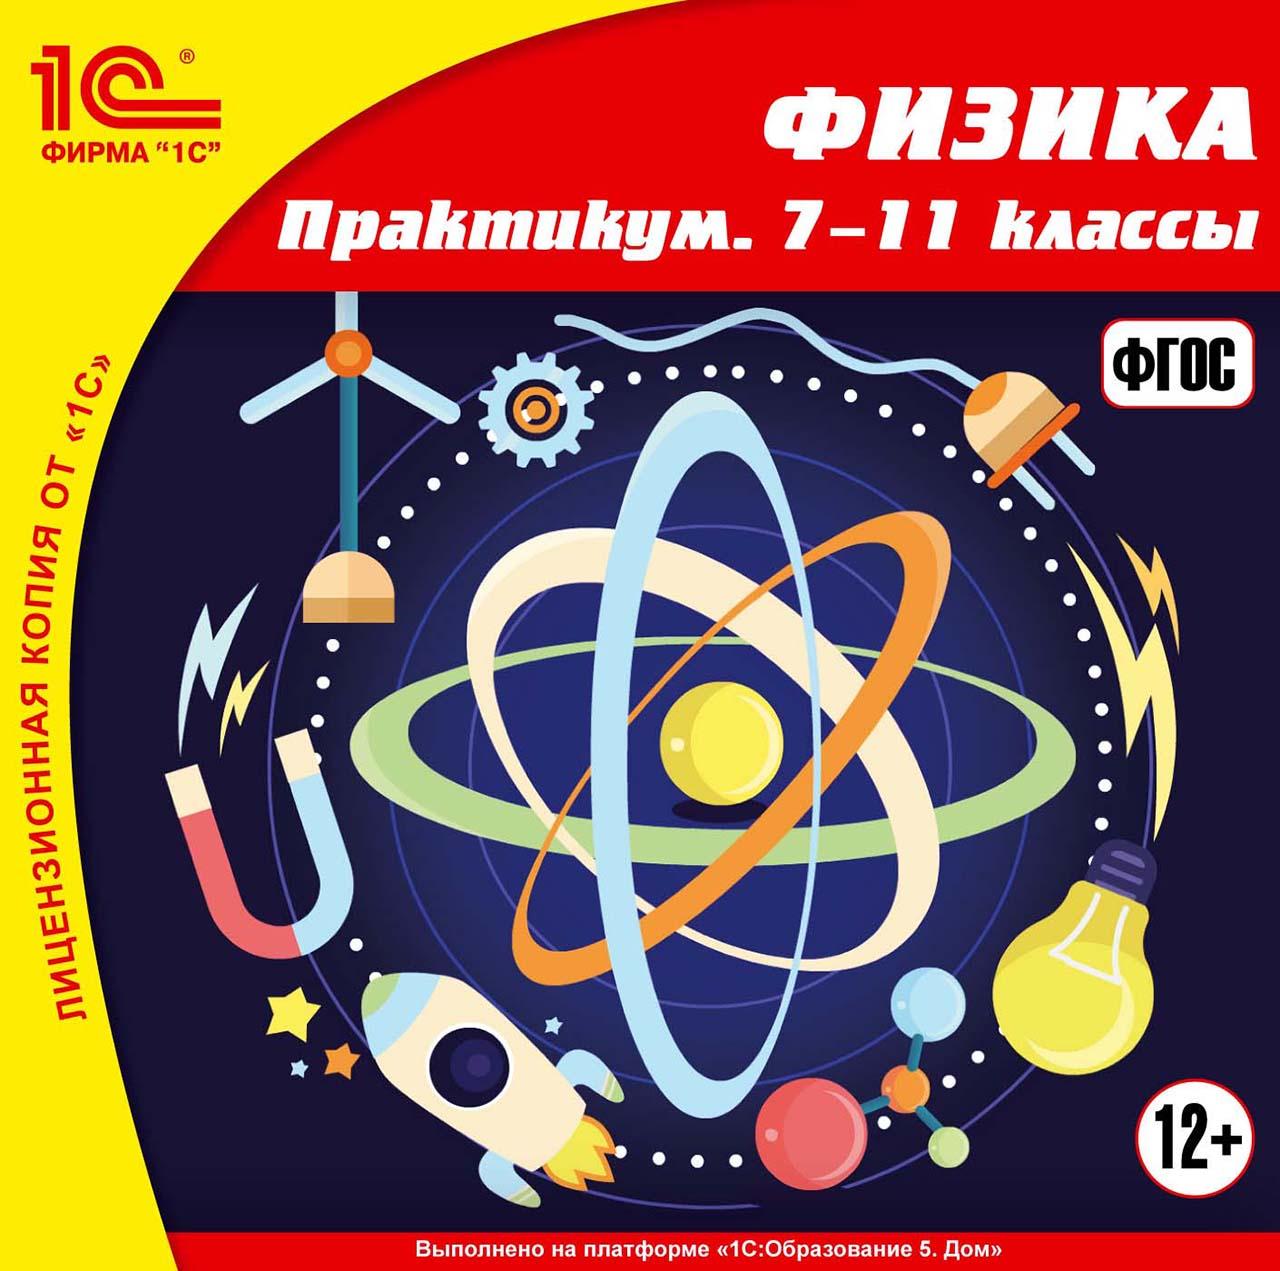 Физика. Практикум. 7–11 классы вера мазурова физика учебное пособие